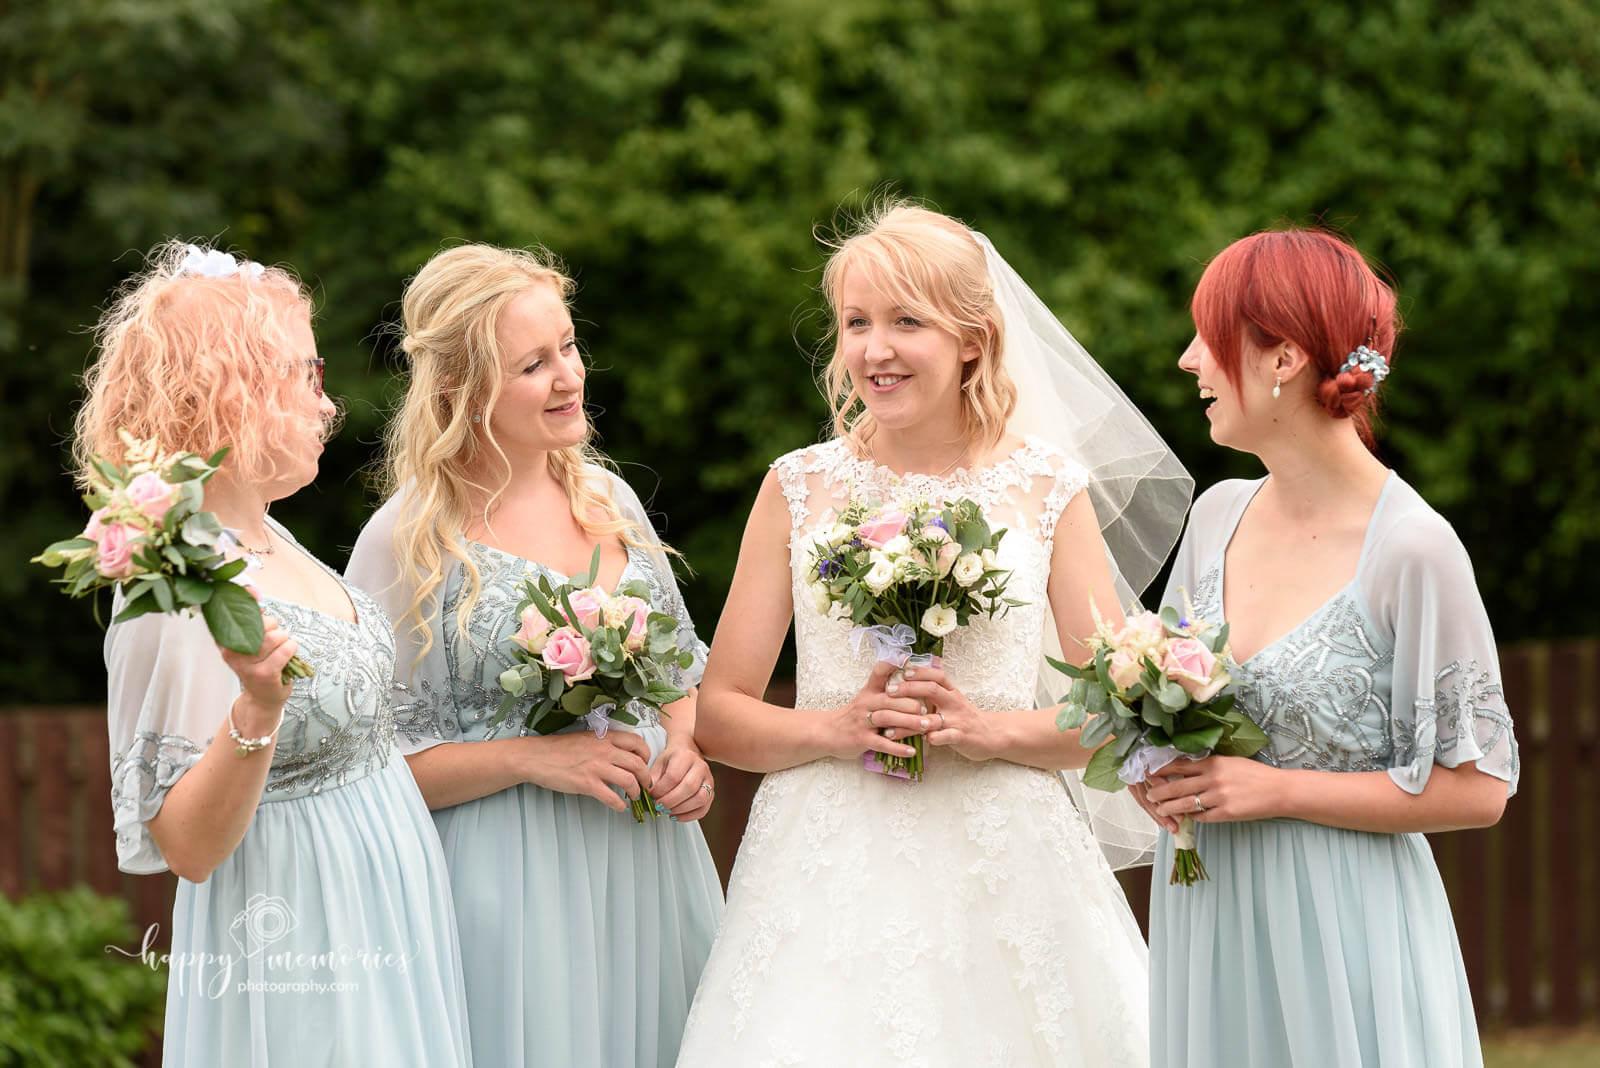 Wedding photographer East Grinstead-28